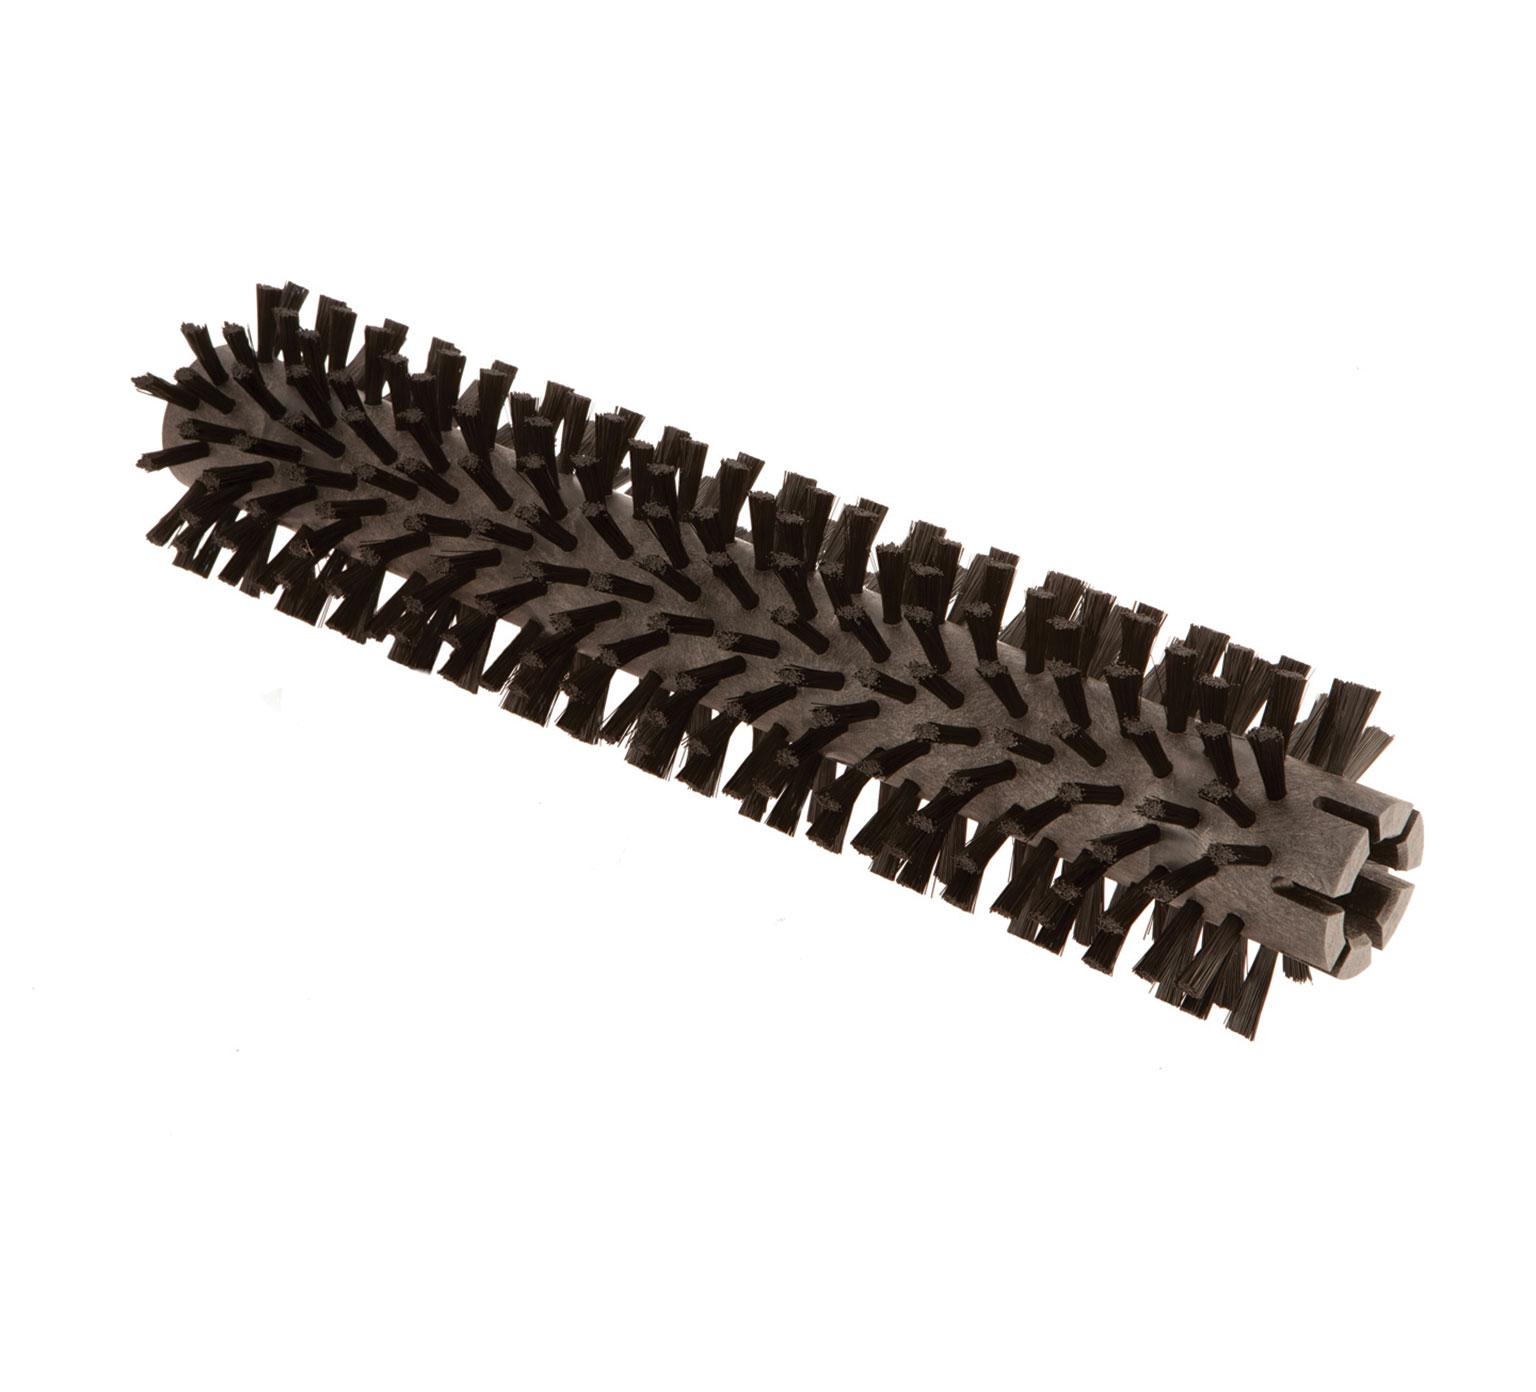 Tennanttrue Nylon Scrub Brush 15 X 3 5 In Pn 1028954